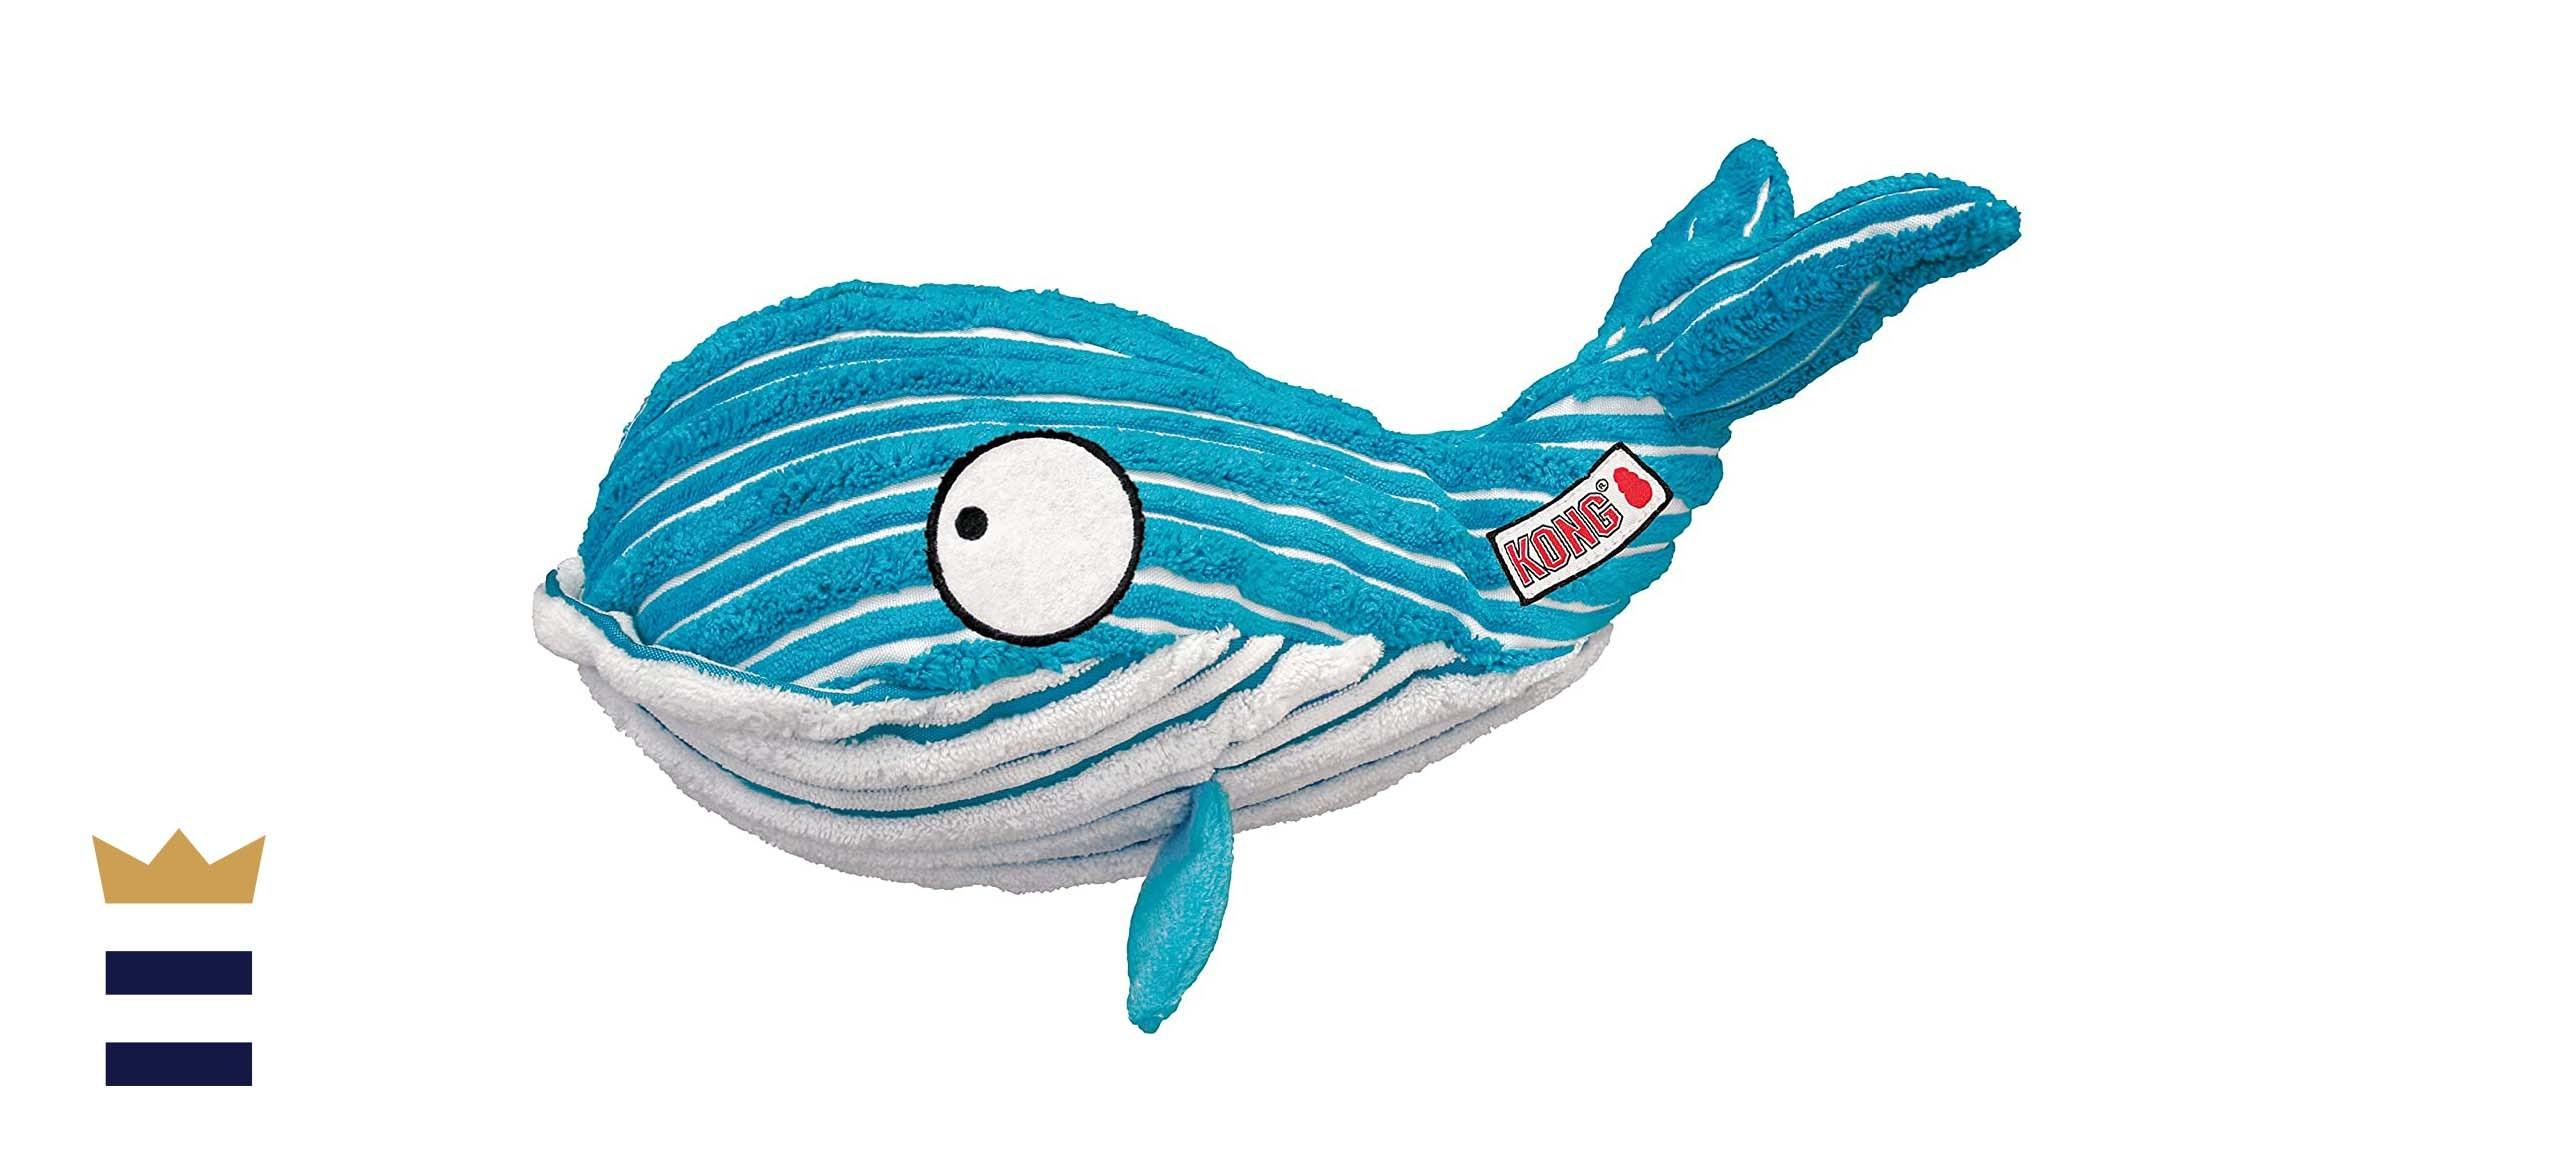 KONG whale